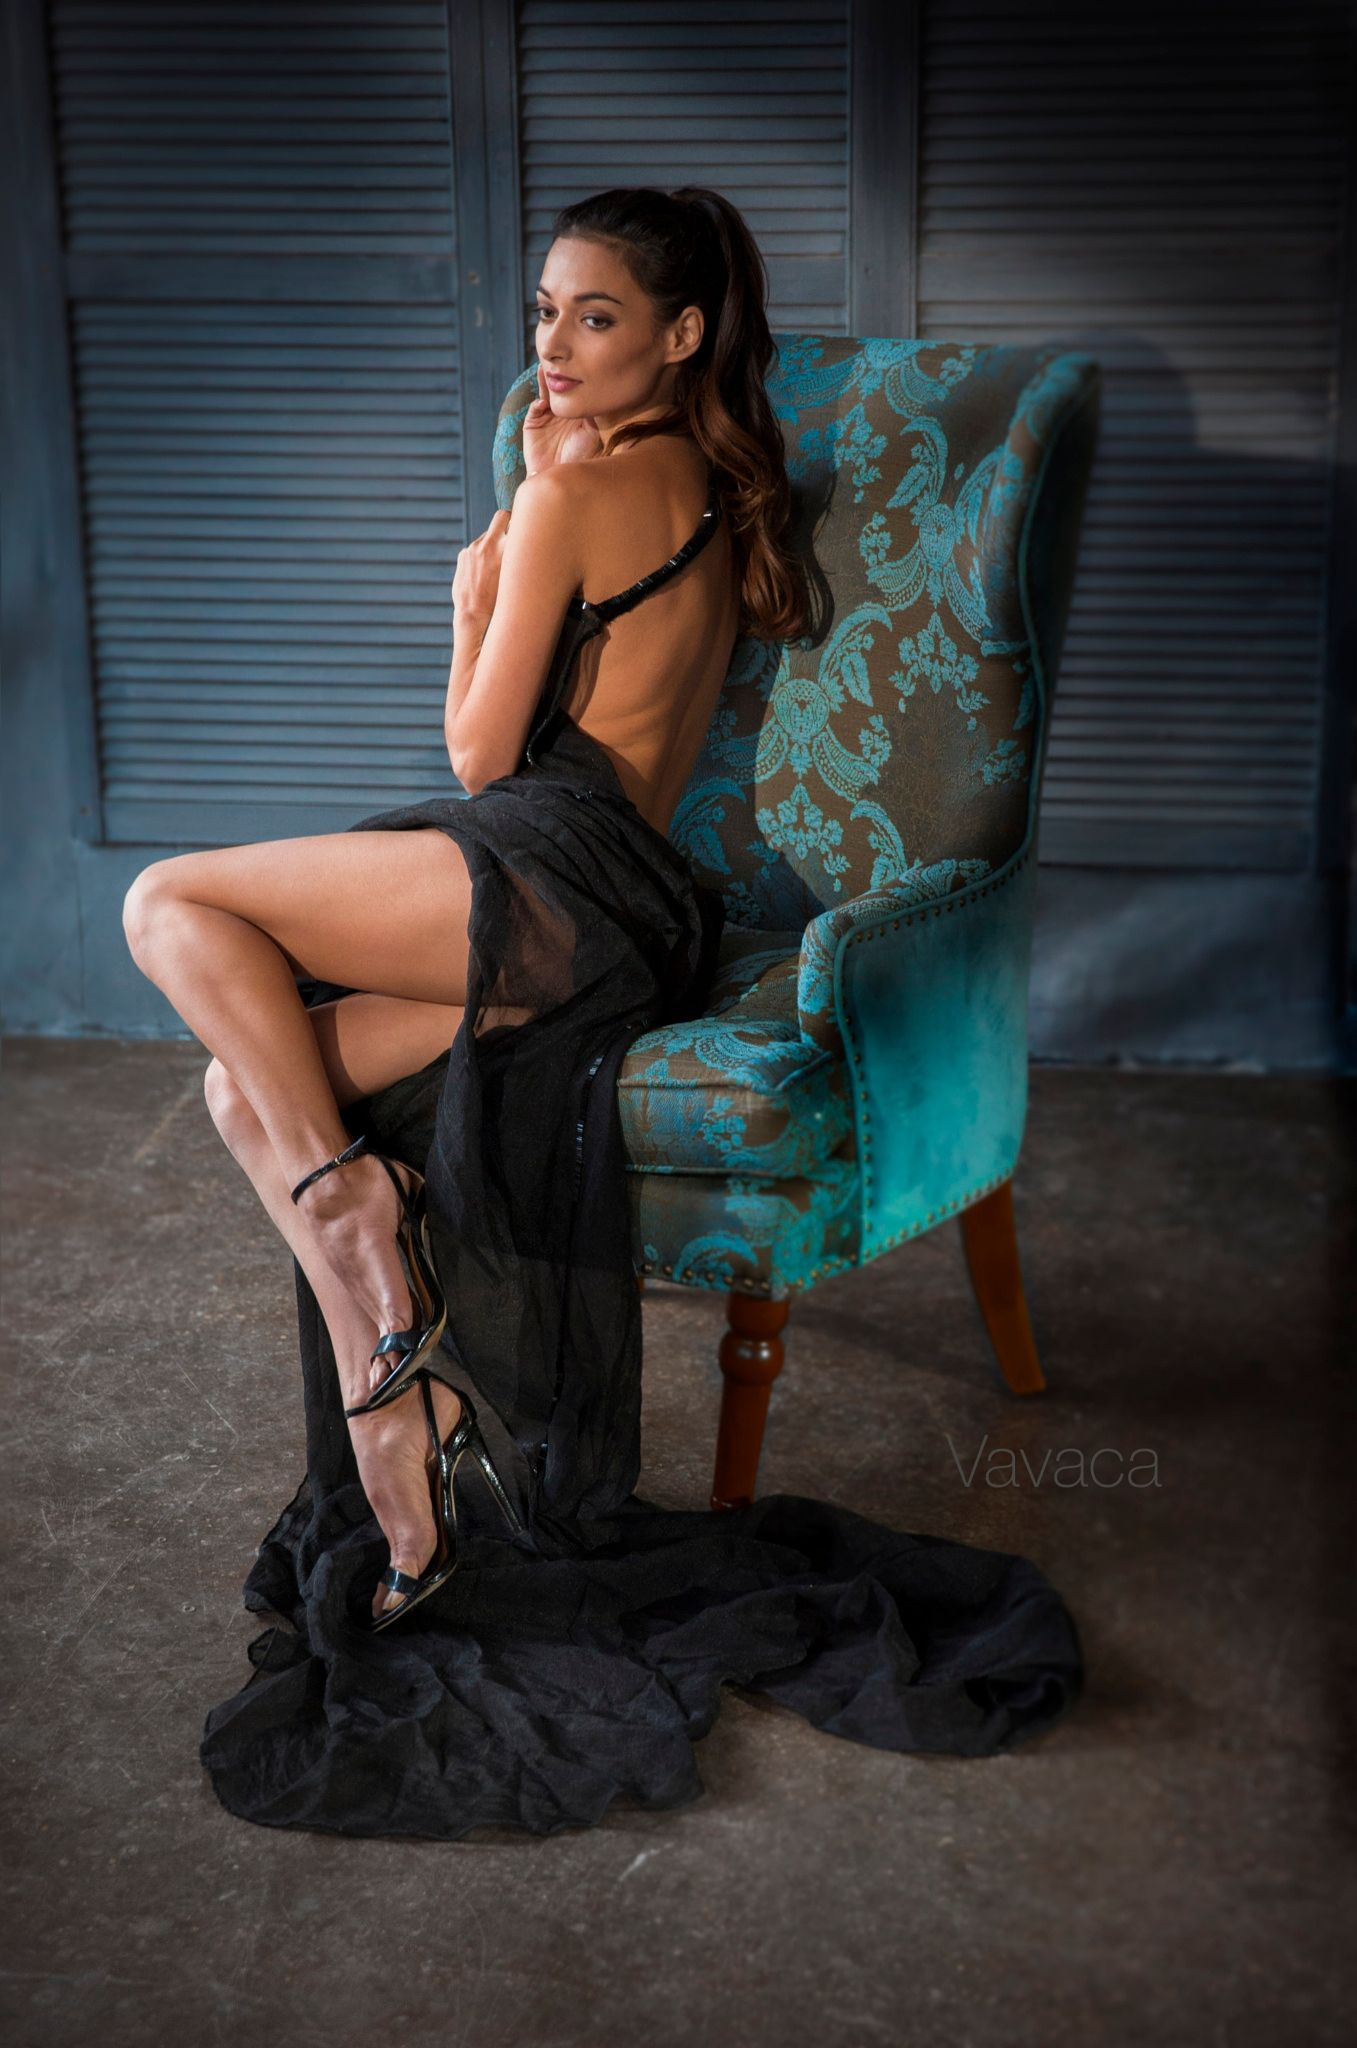 Naya Mamedova nudes (13 gallery), leaked Fappening, YouTube, cleavage 2017